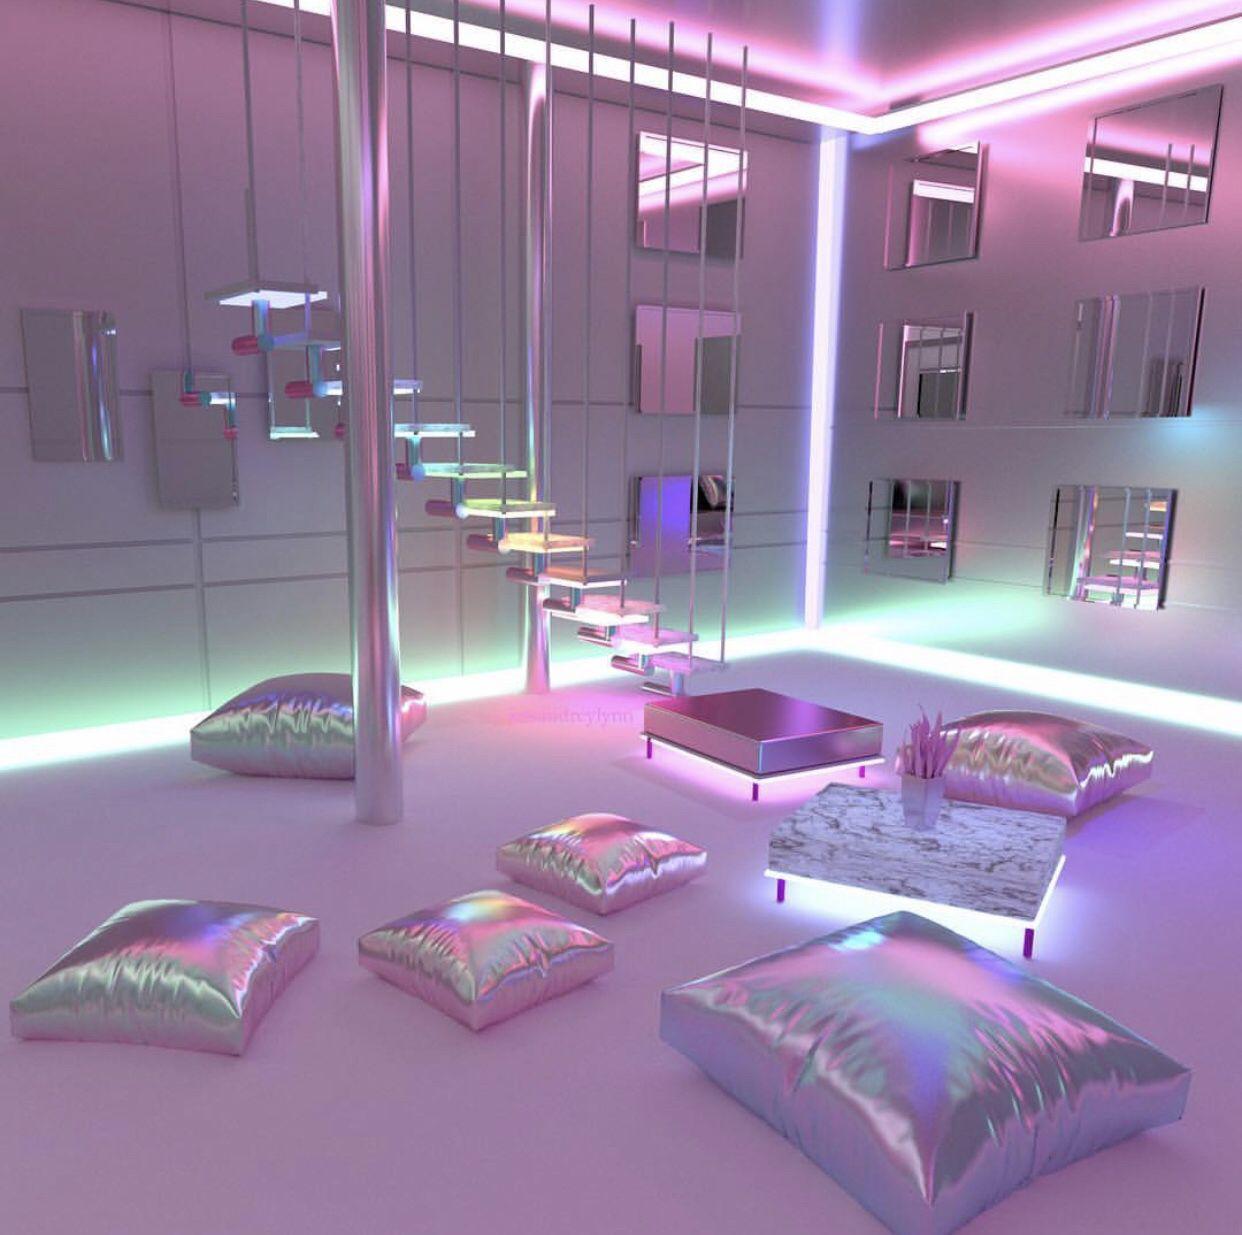 Pin by Meryem Tahri on • sanal •  Neon room, Dream rooms